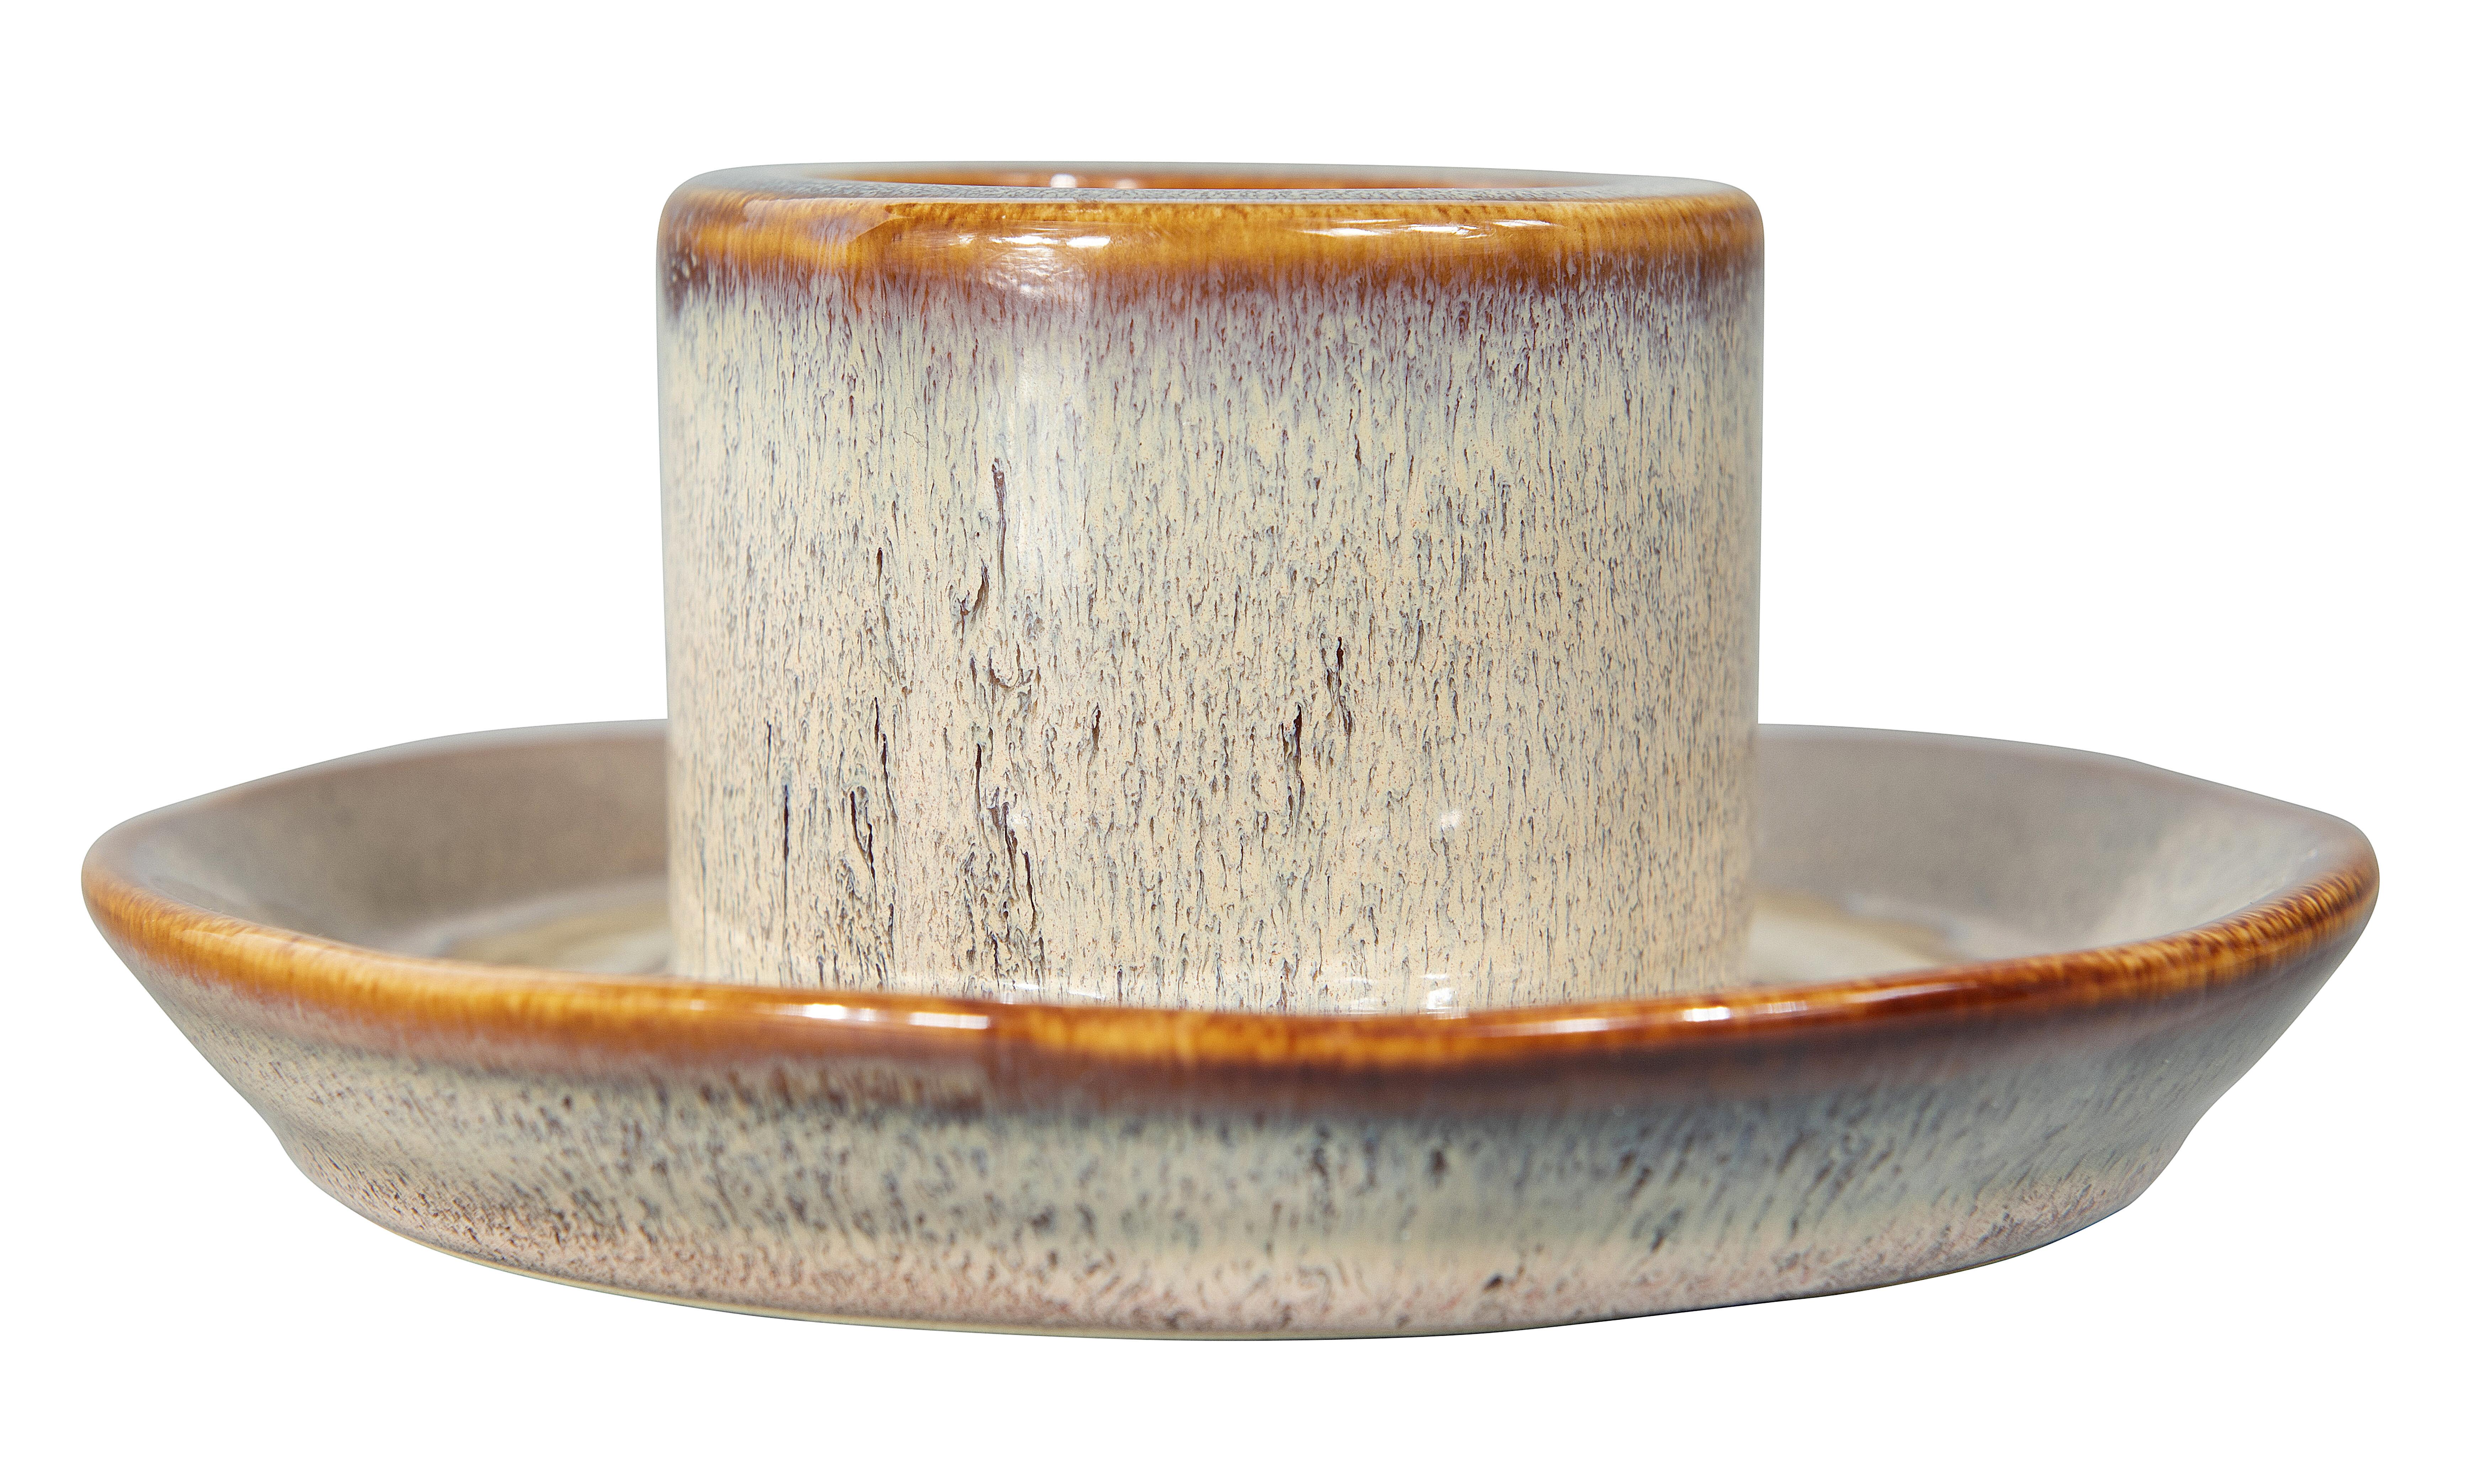 Ceramic Tea Light Candle Holders You Ll Love In 2021 Wayfair